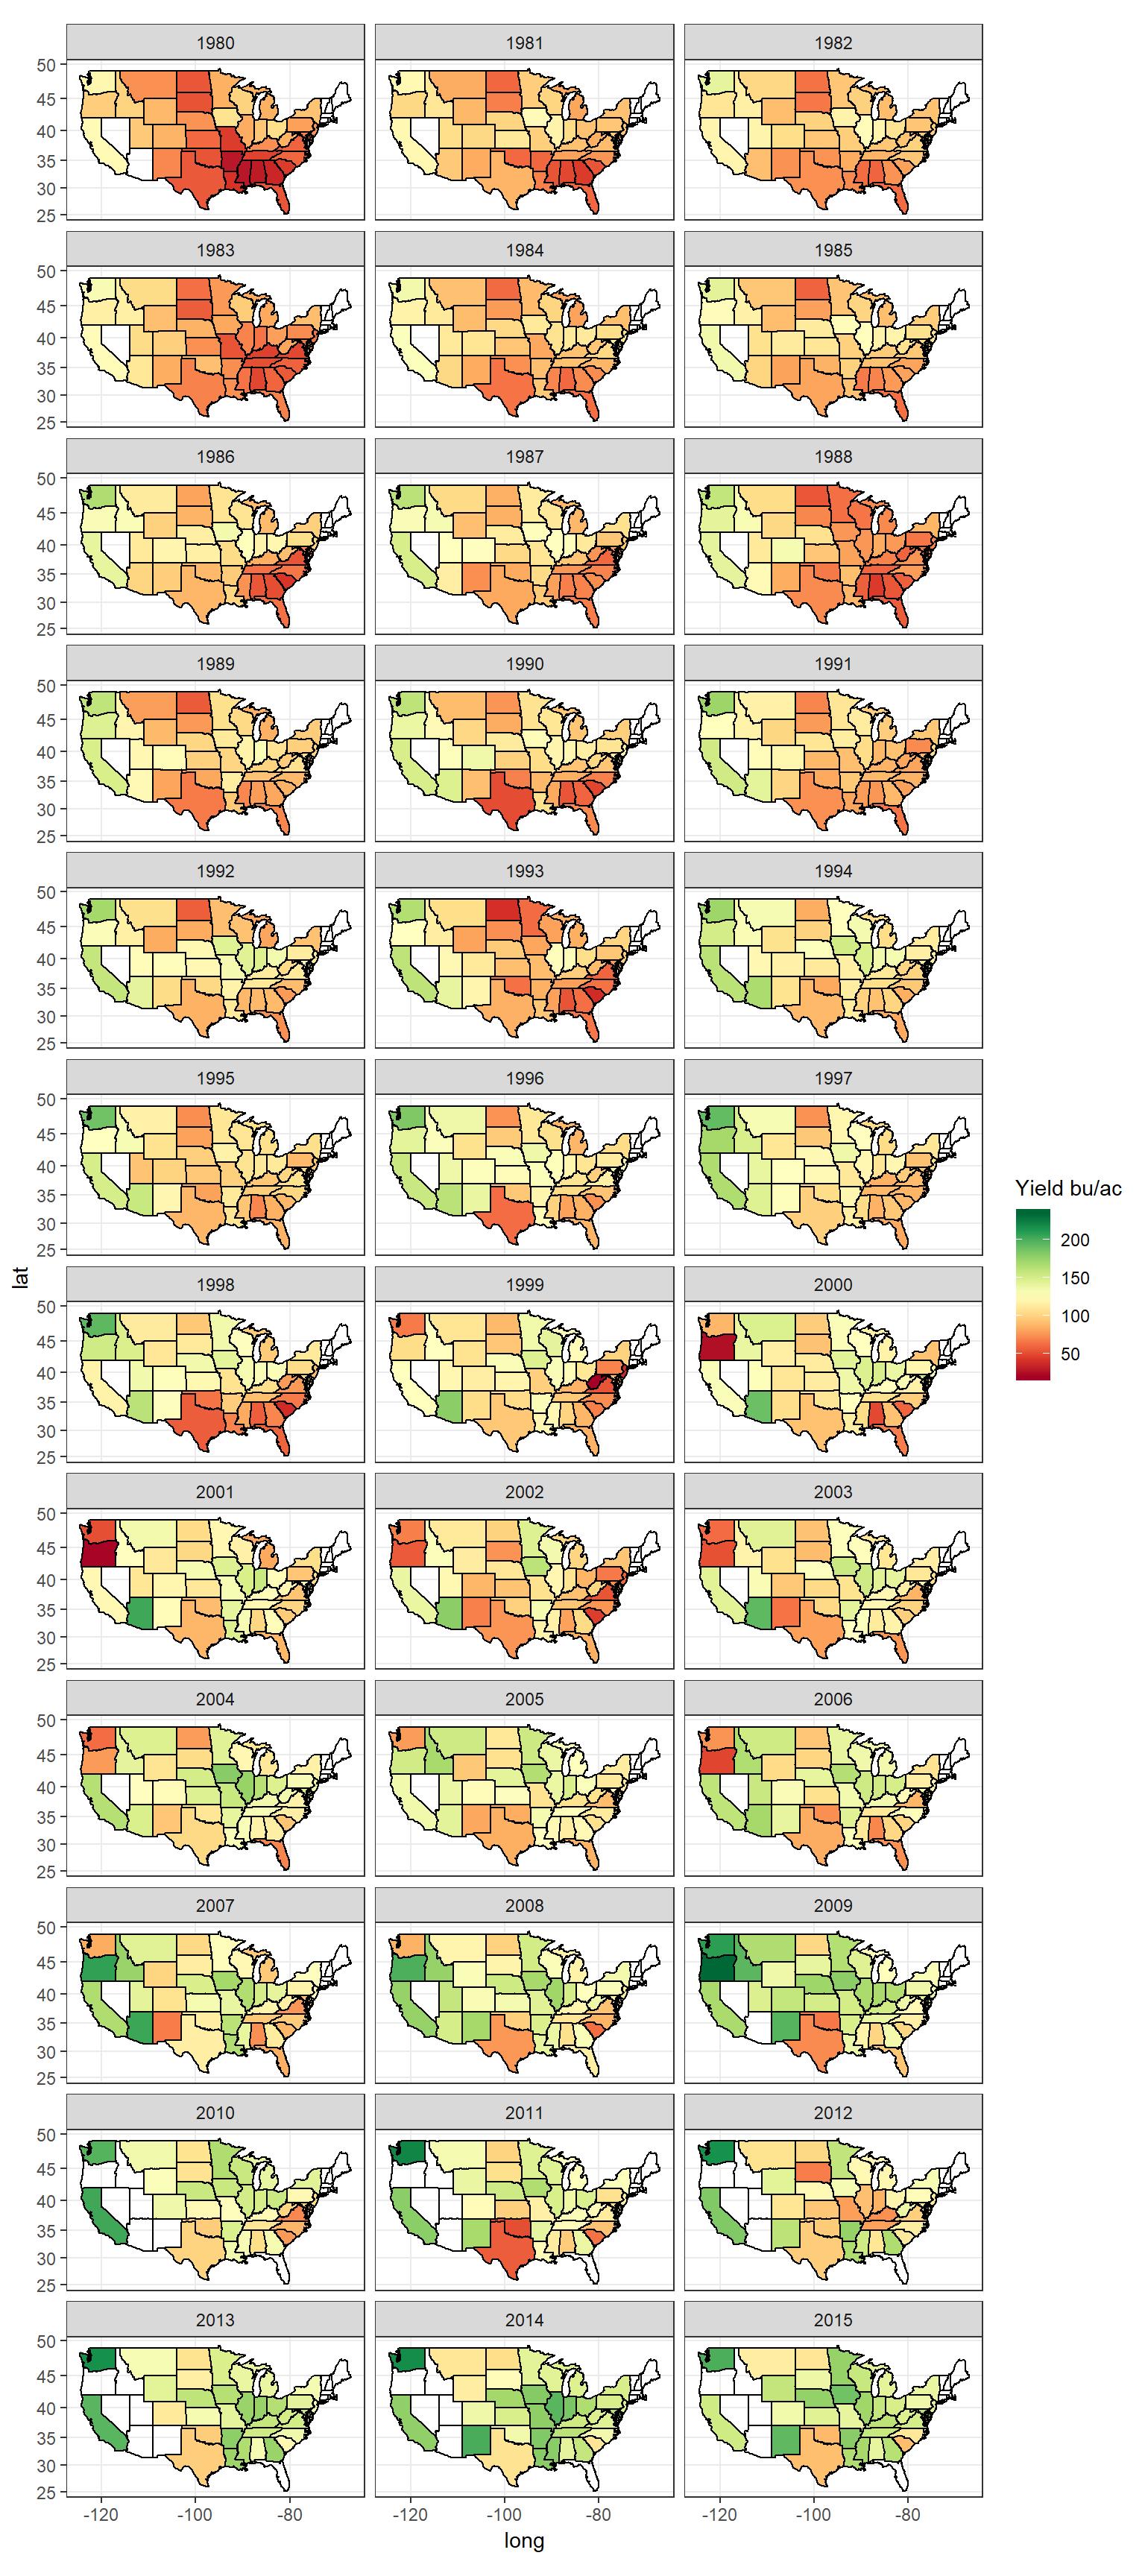 State average corn yield, years 1980 - 2015